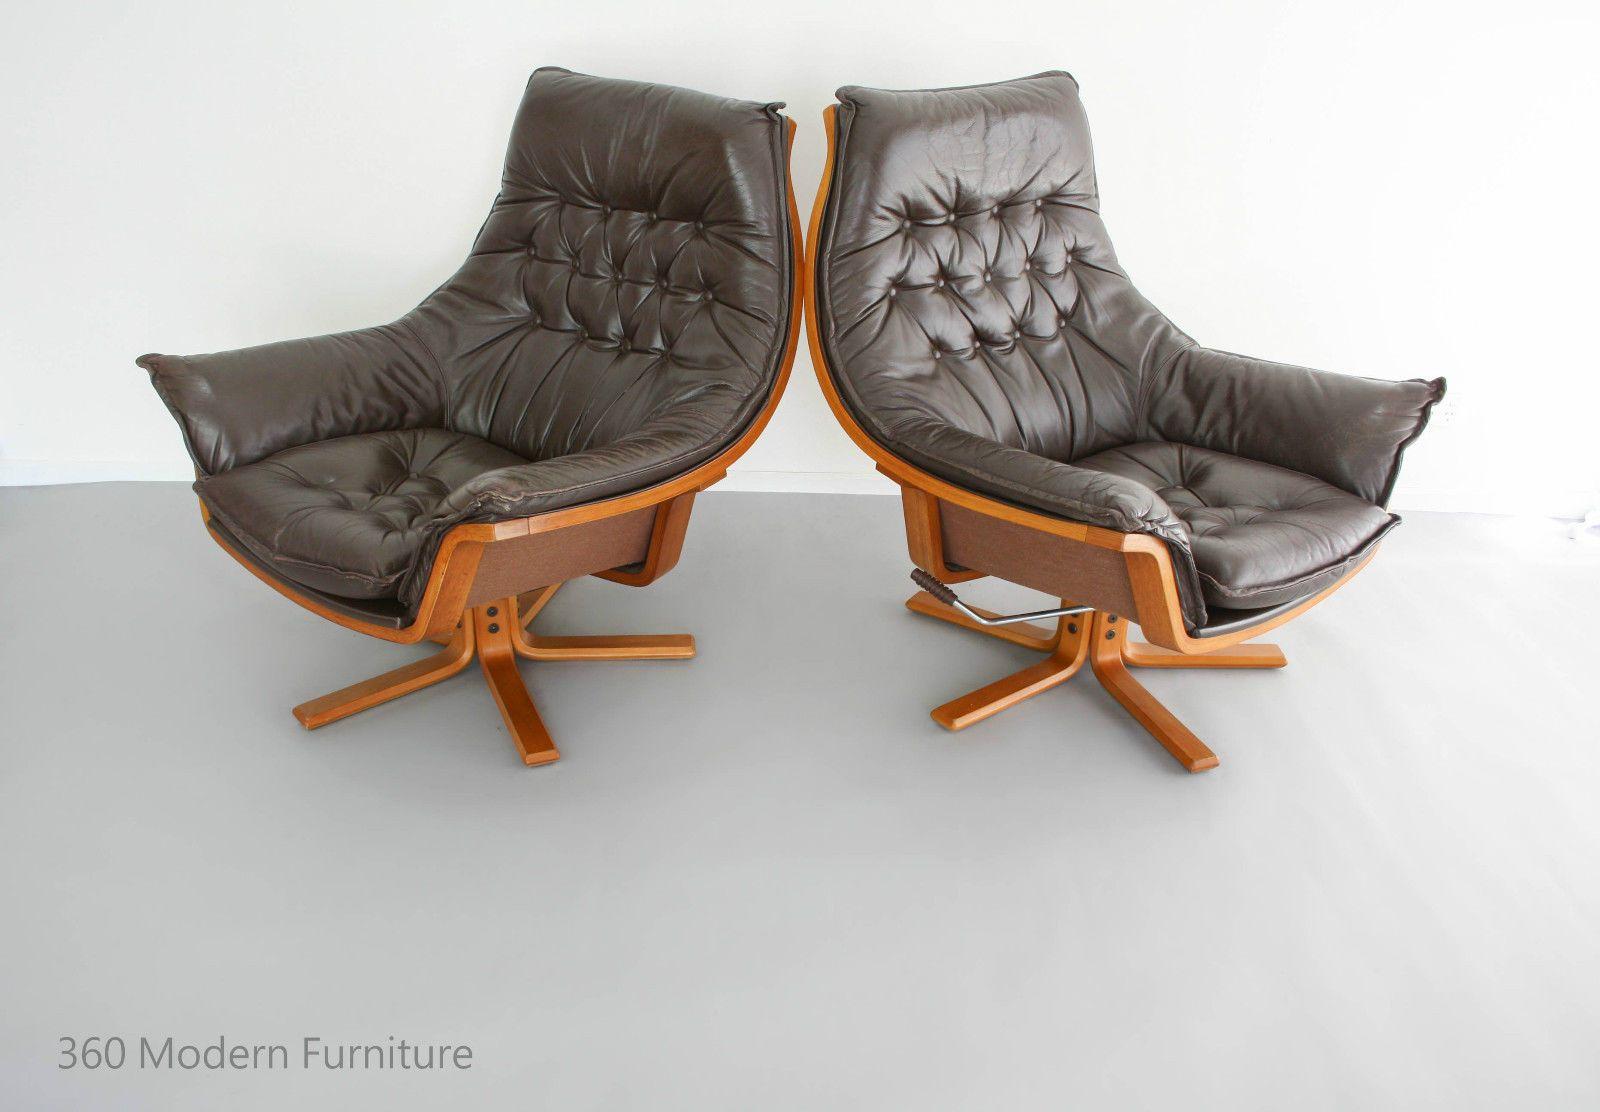 Mid Century Armchairs X2 Danish Deluxe Leather Swivel Rocker Recliner Bentwood Retro Vintage Lounge Vintage Lounge Chair Mid Century Armchair Modern Furniture